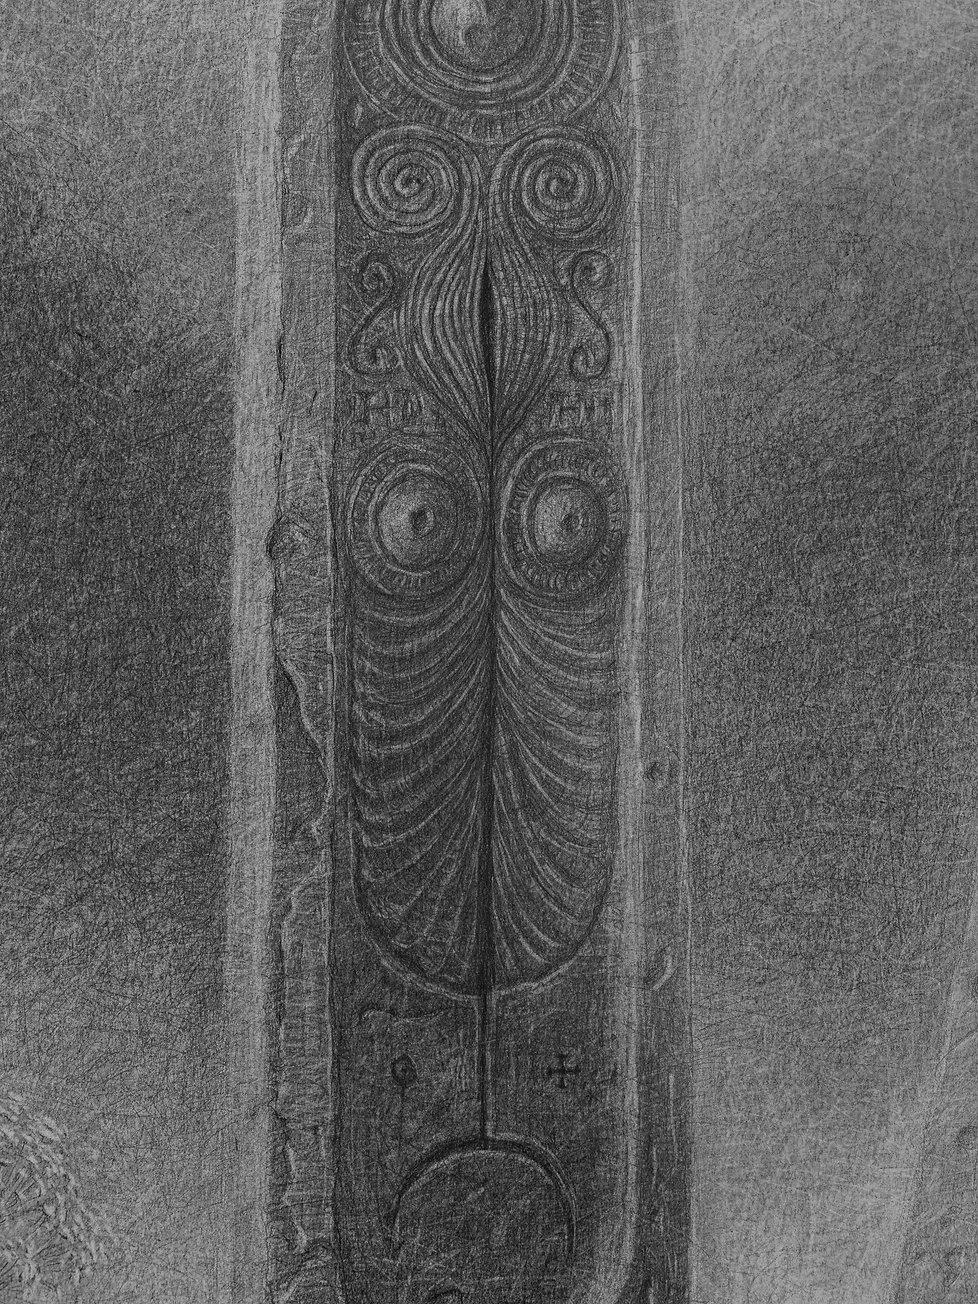 Ancient Monolith d1.jpg